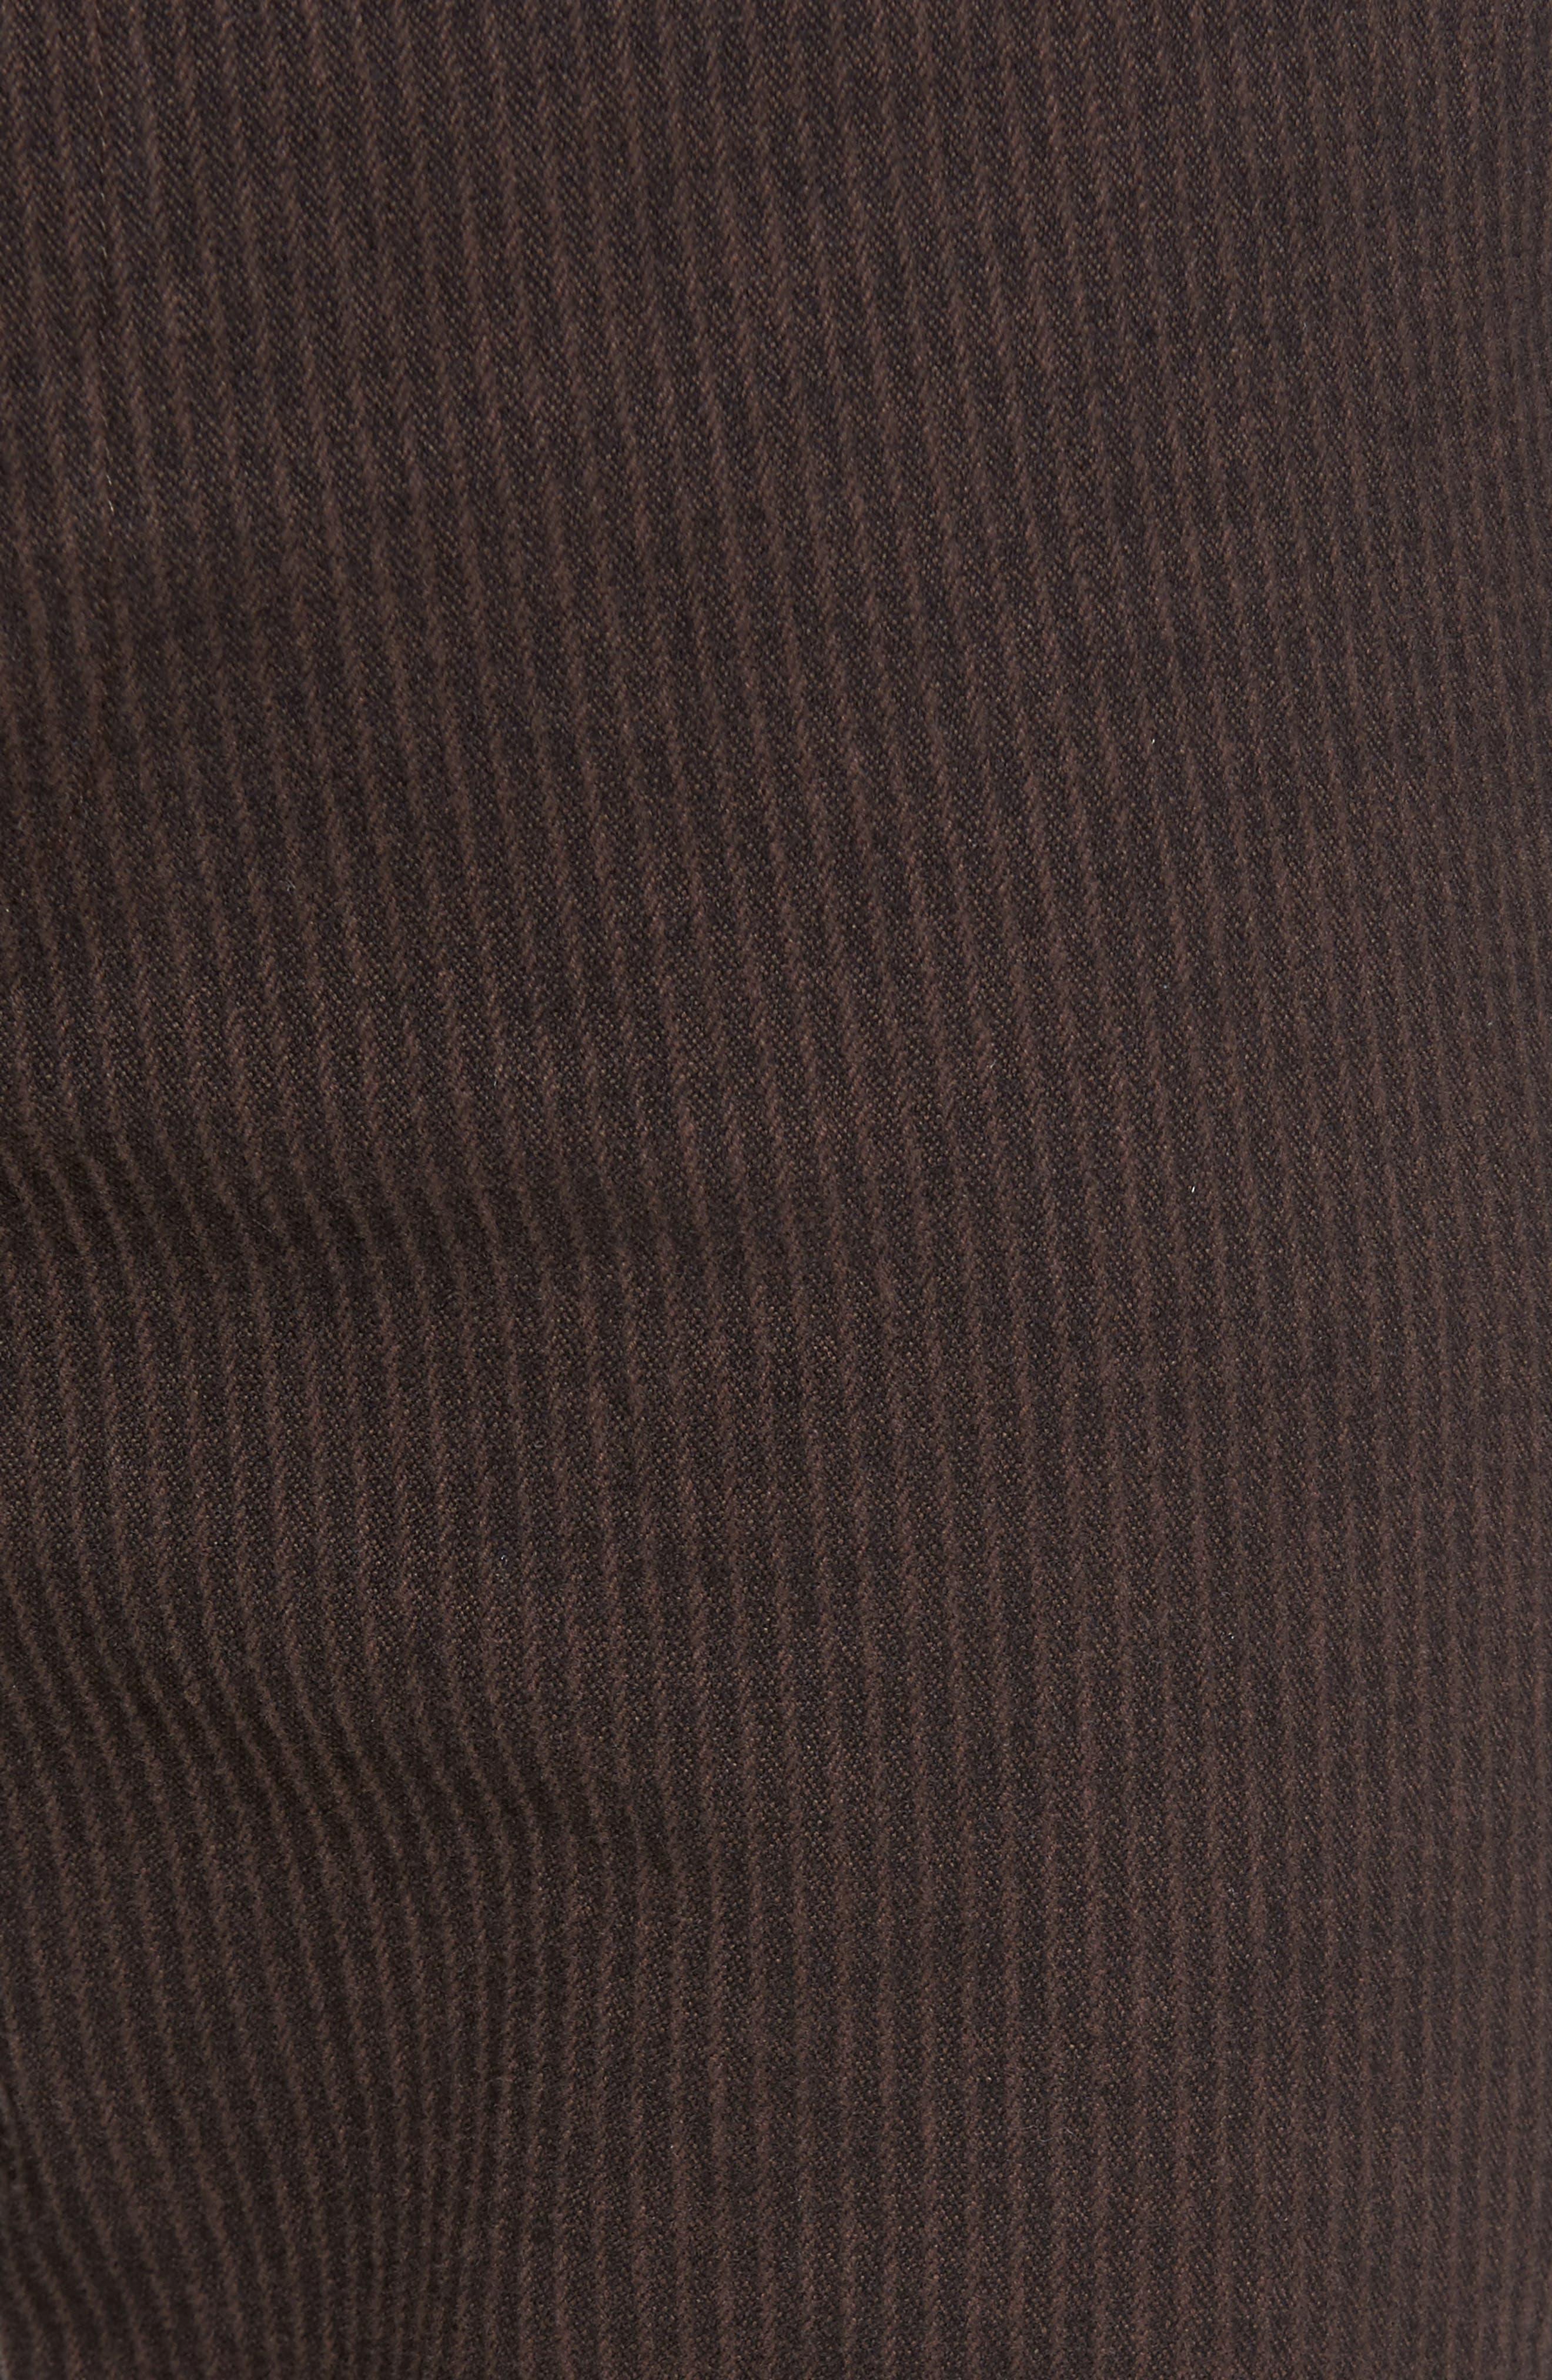 Marshall Slim Fit Pinstripe Pants,                             Alternate thumbnail 6, color,                             Dark Oakwood